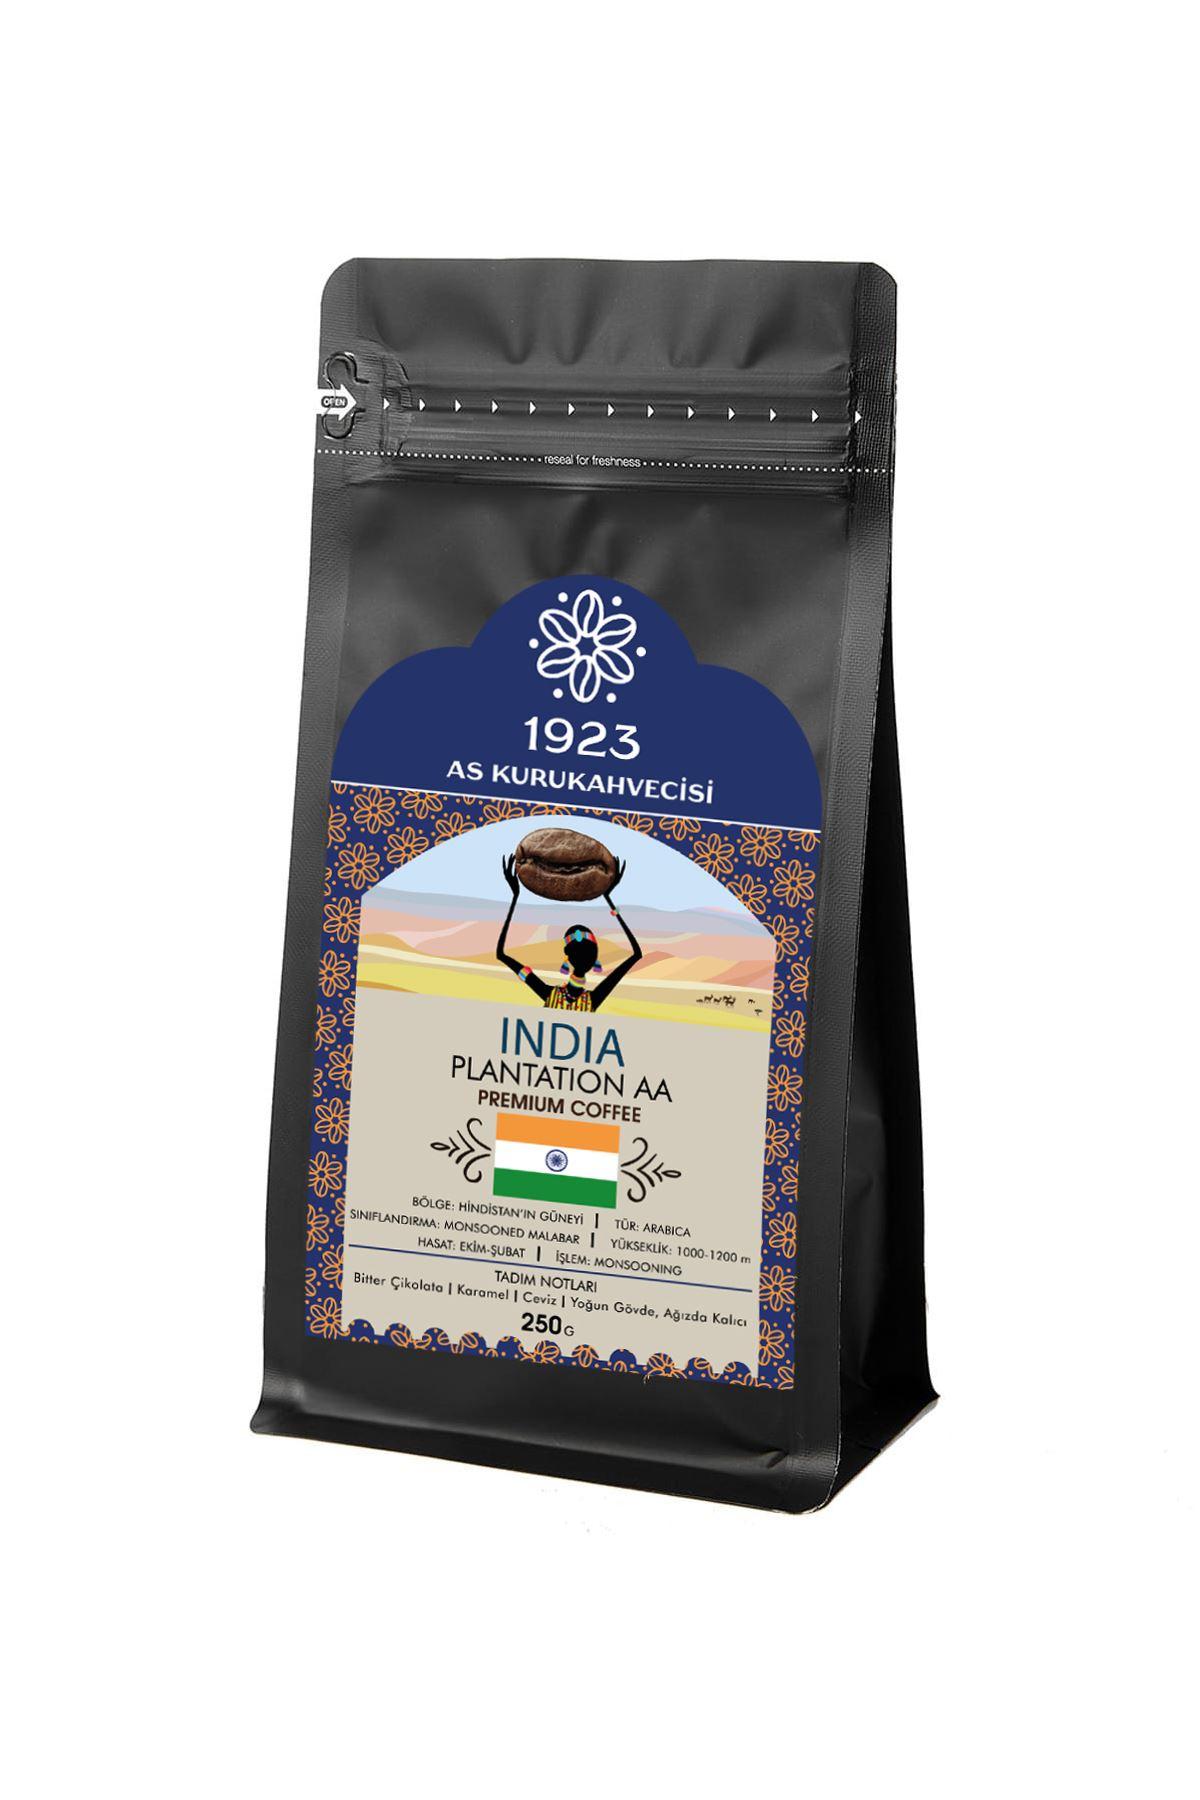 India Plantation AA Filtre Kahve 250 gr.